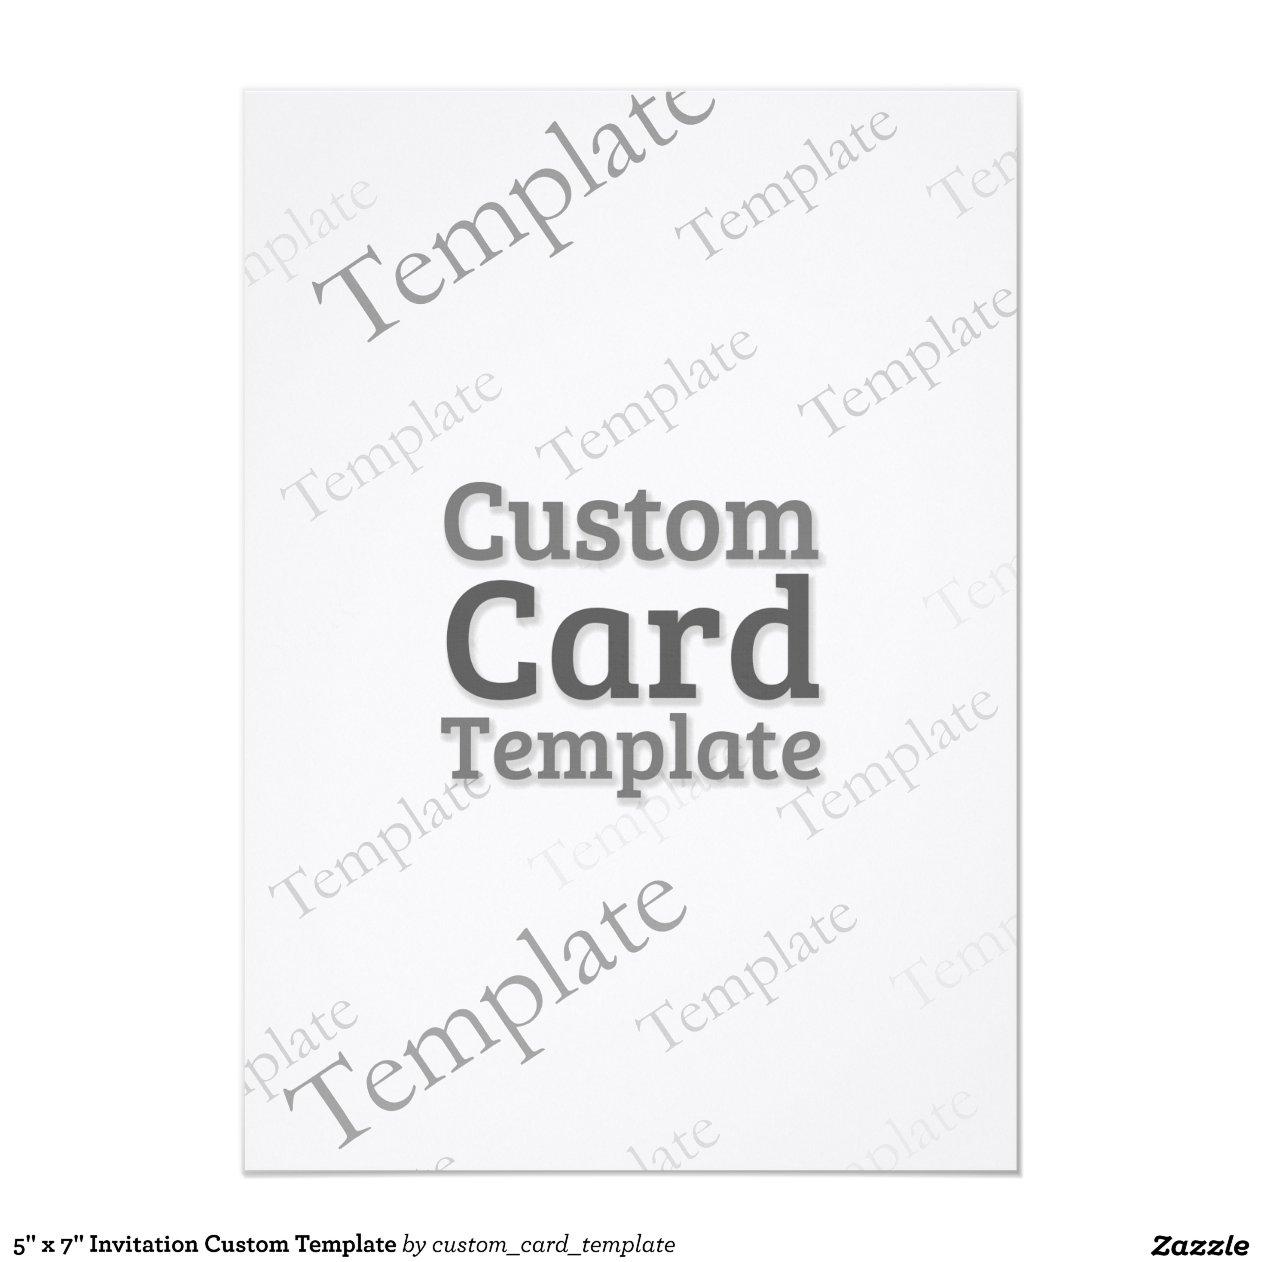 Invitation Custom Template 5u0026quot; X 7u0026quot; Invitation Card : Zazzle